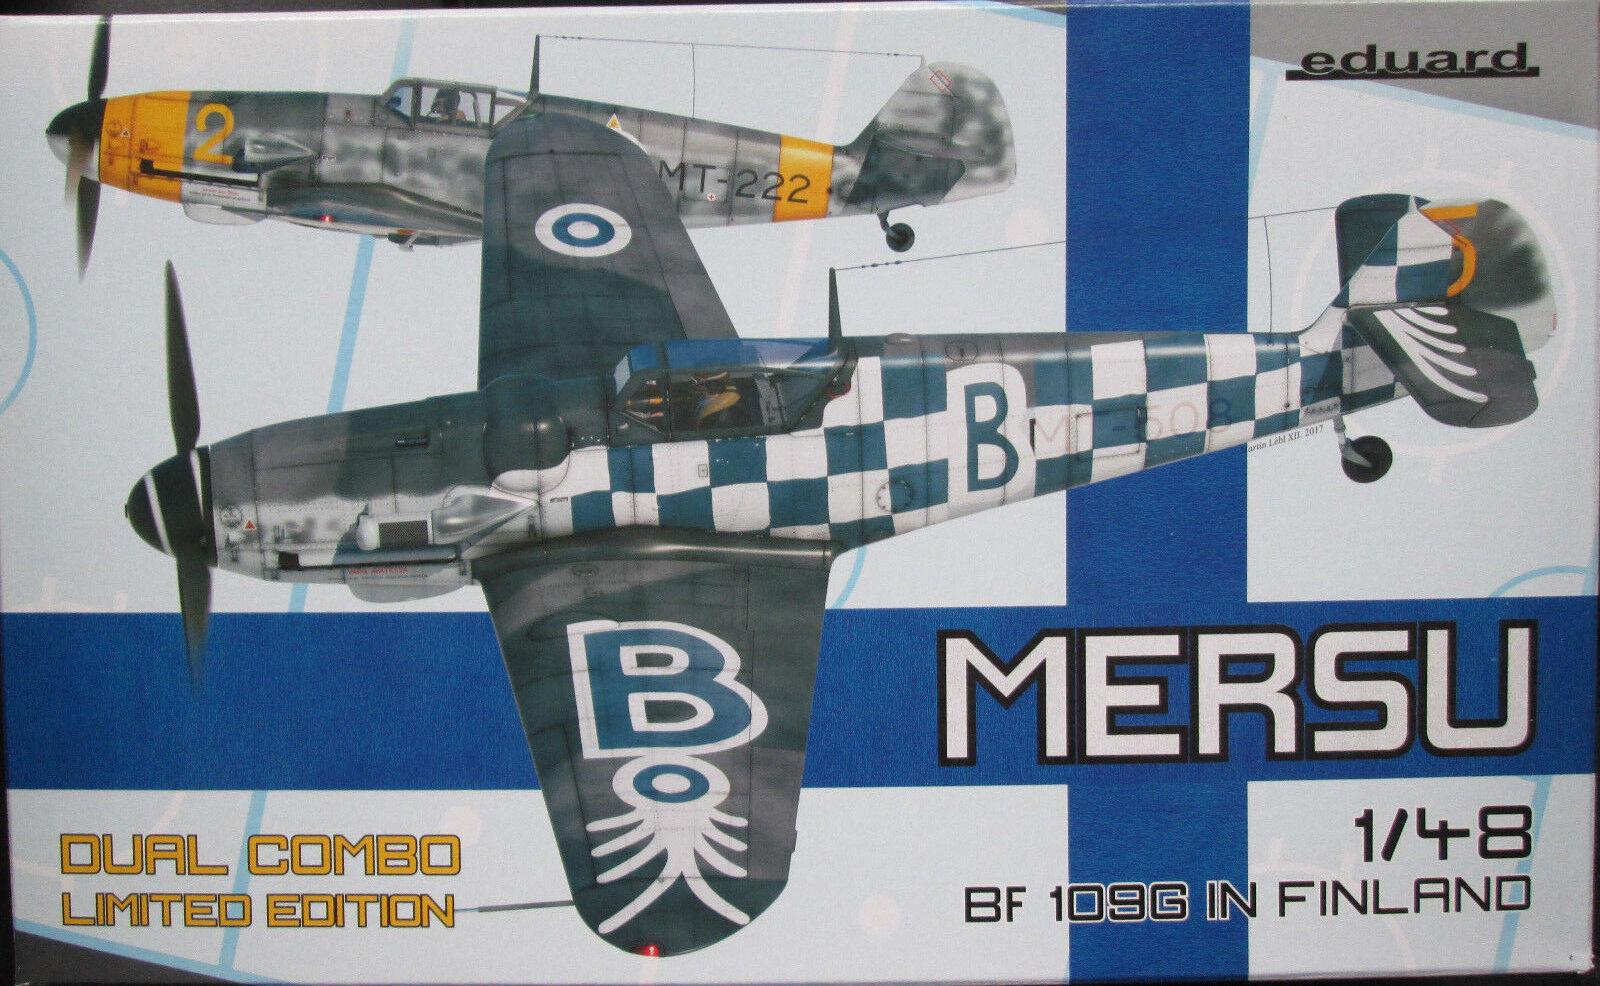 Eduard 1 48 EDK11114 Messerschmitt Bf109G 'Mersu' Finnish Dual combo Ltd Ed kit